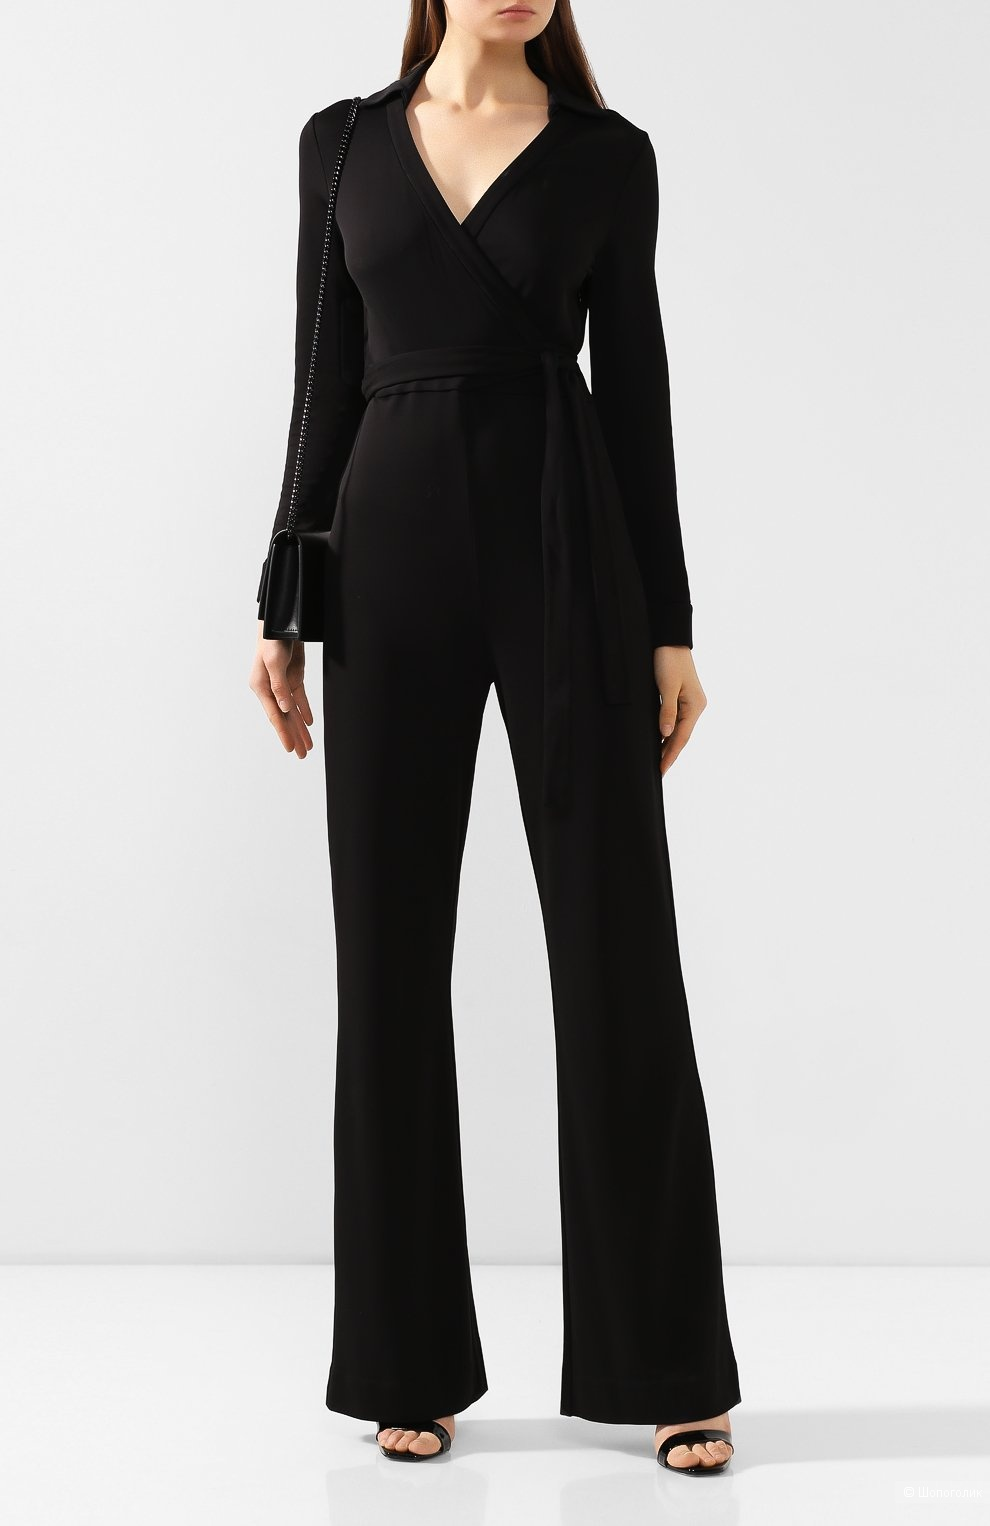 Комбинезон Diane von Furstenberg, 4 размер ( на 42-44)